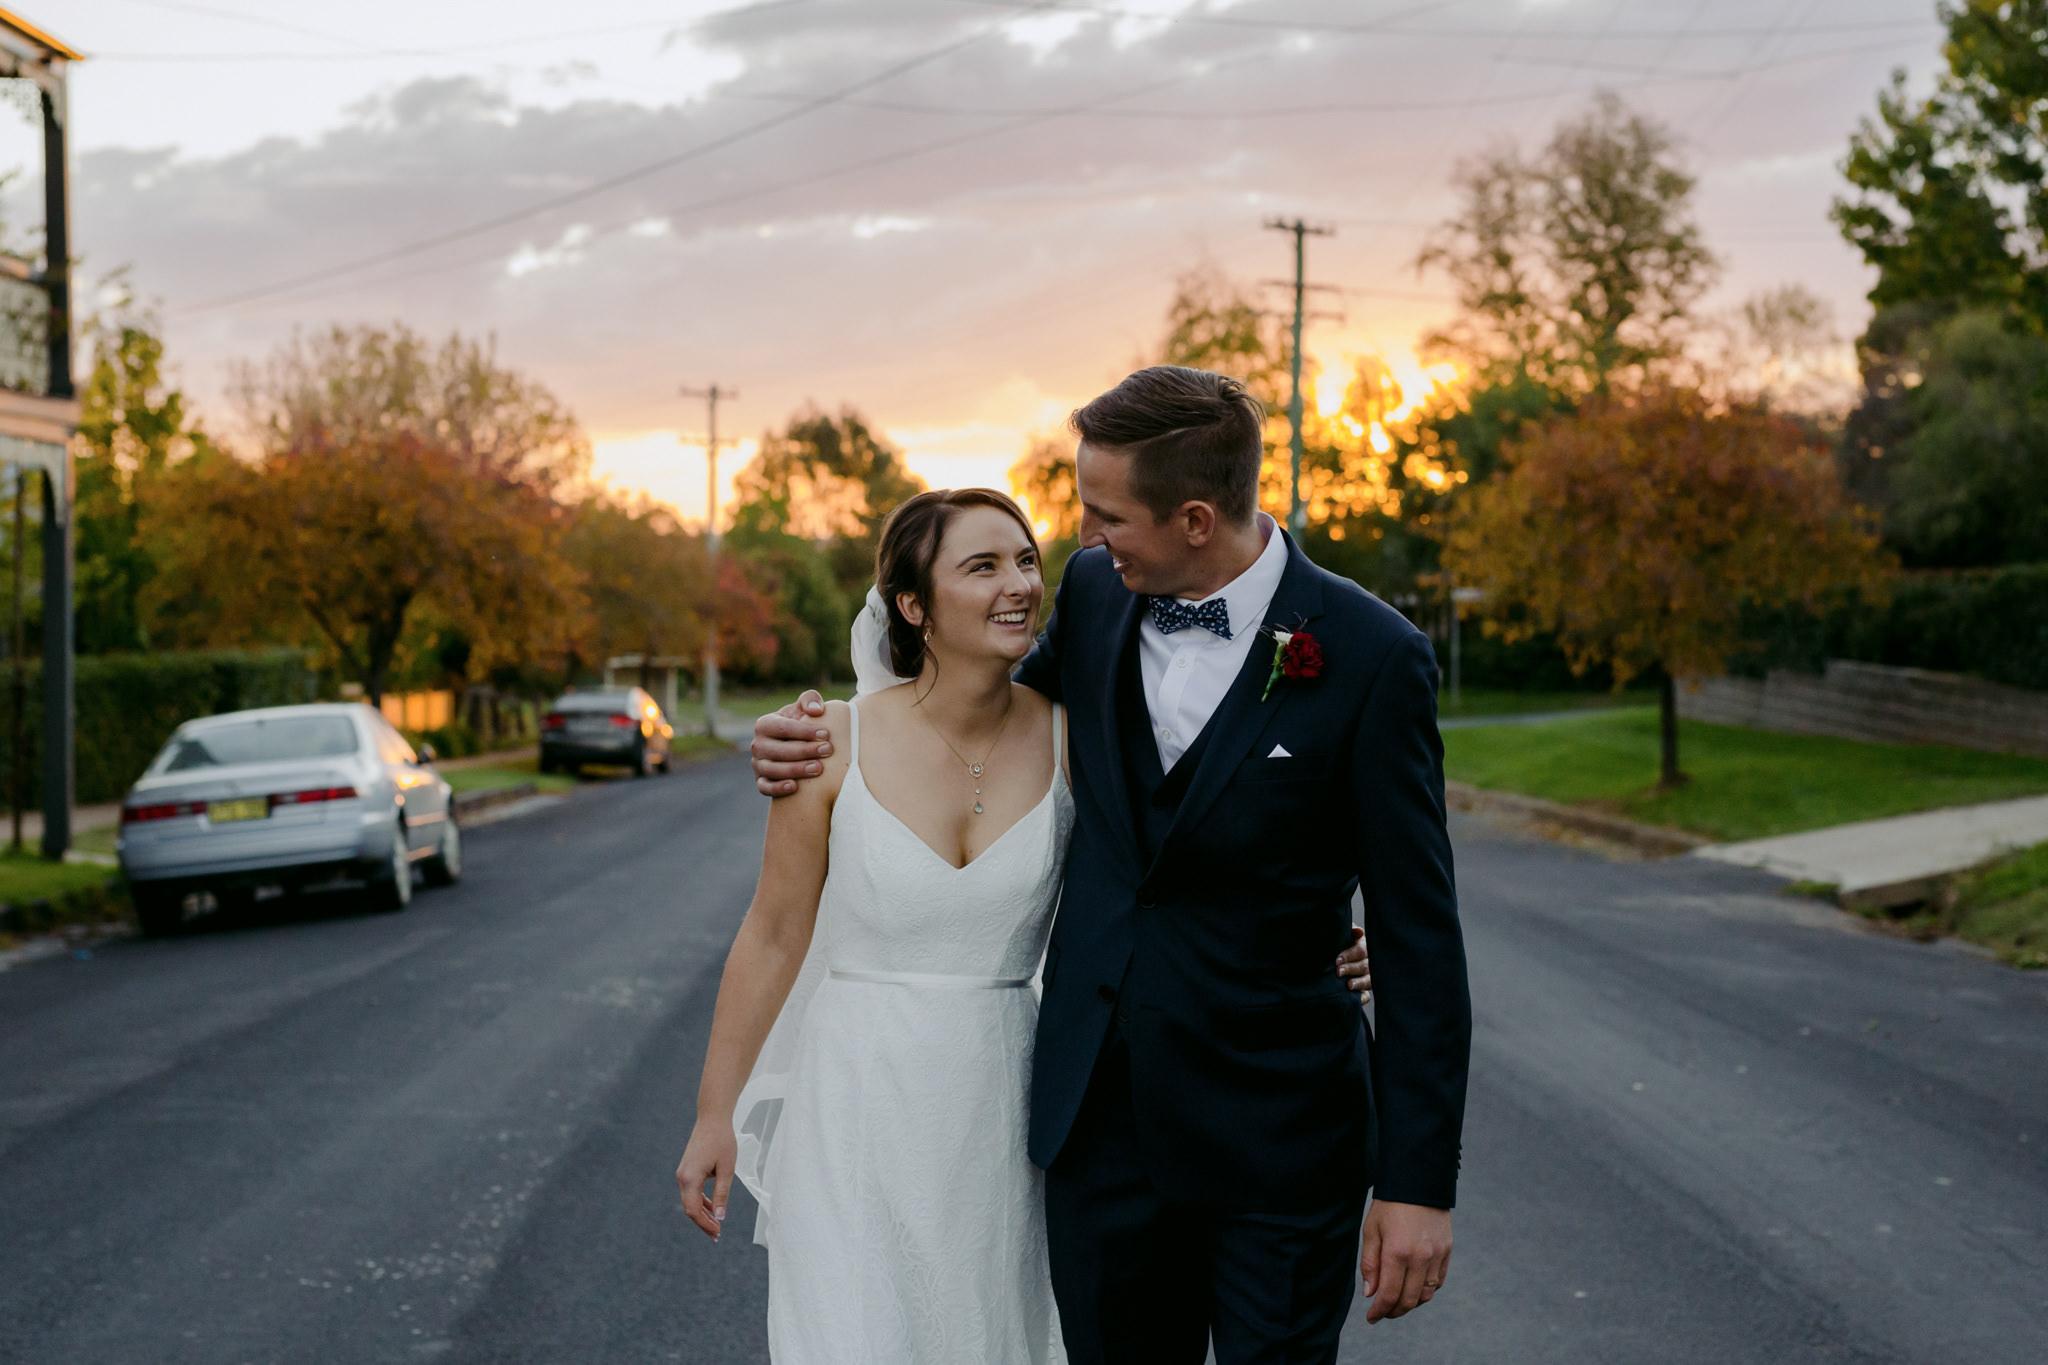 Erin Latimore Mudgee Canberra Wedding Photographer ROSEBANK GUESTHOUSE OLD THEATRE TONIC MILLTHORPE_701.JPG